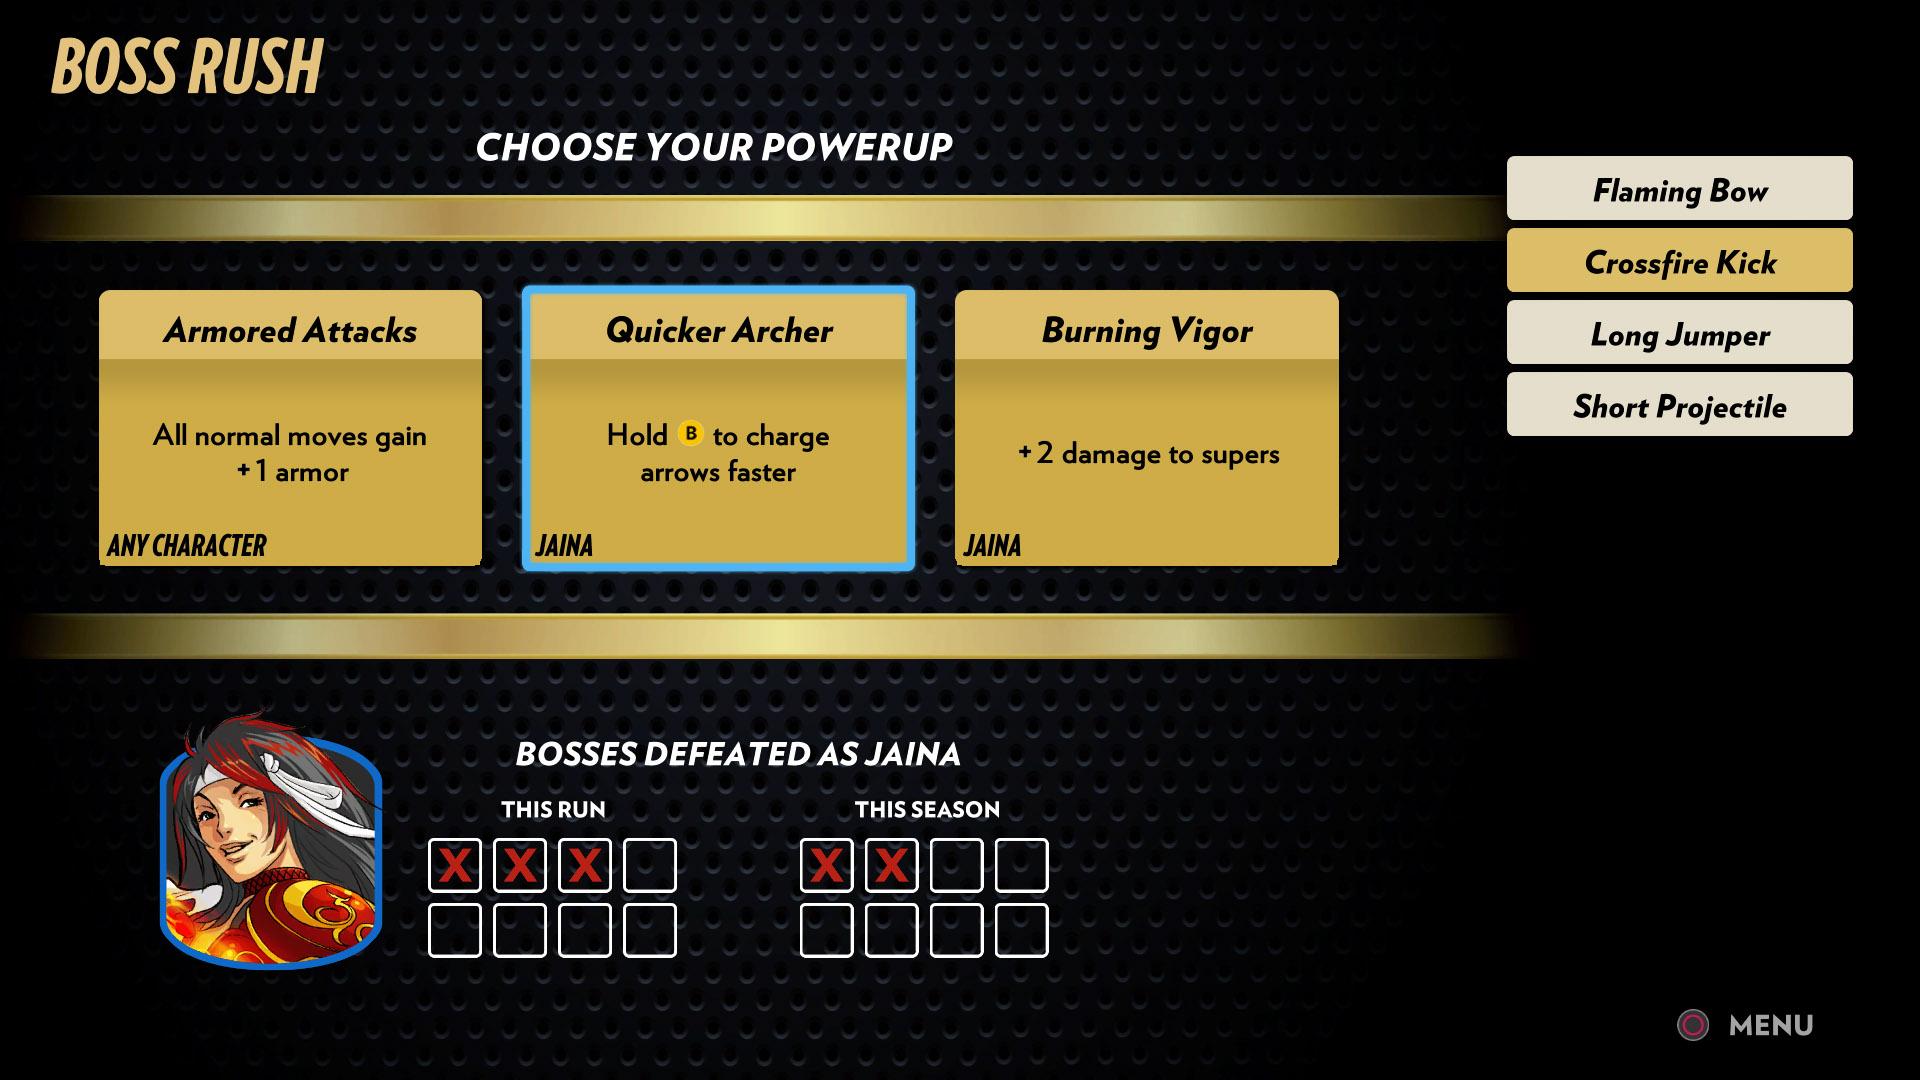 fantasystrike_bossrush_powerup_select.jpg